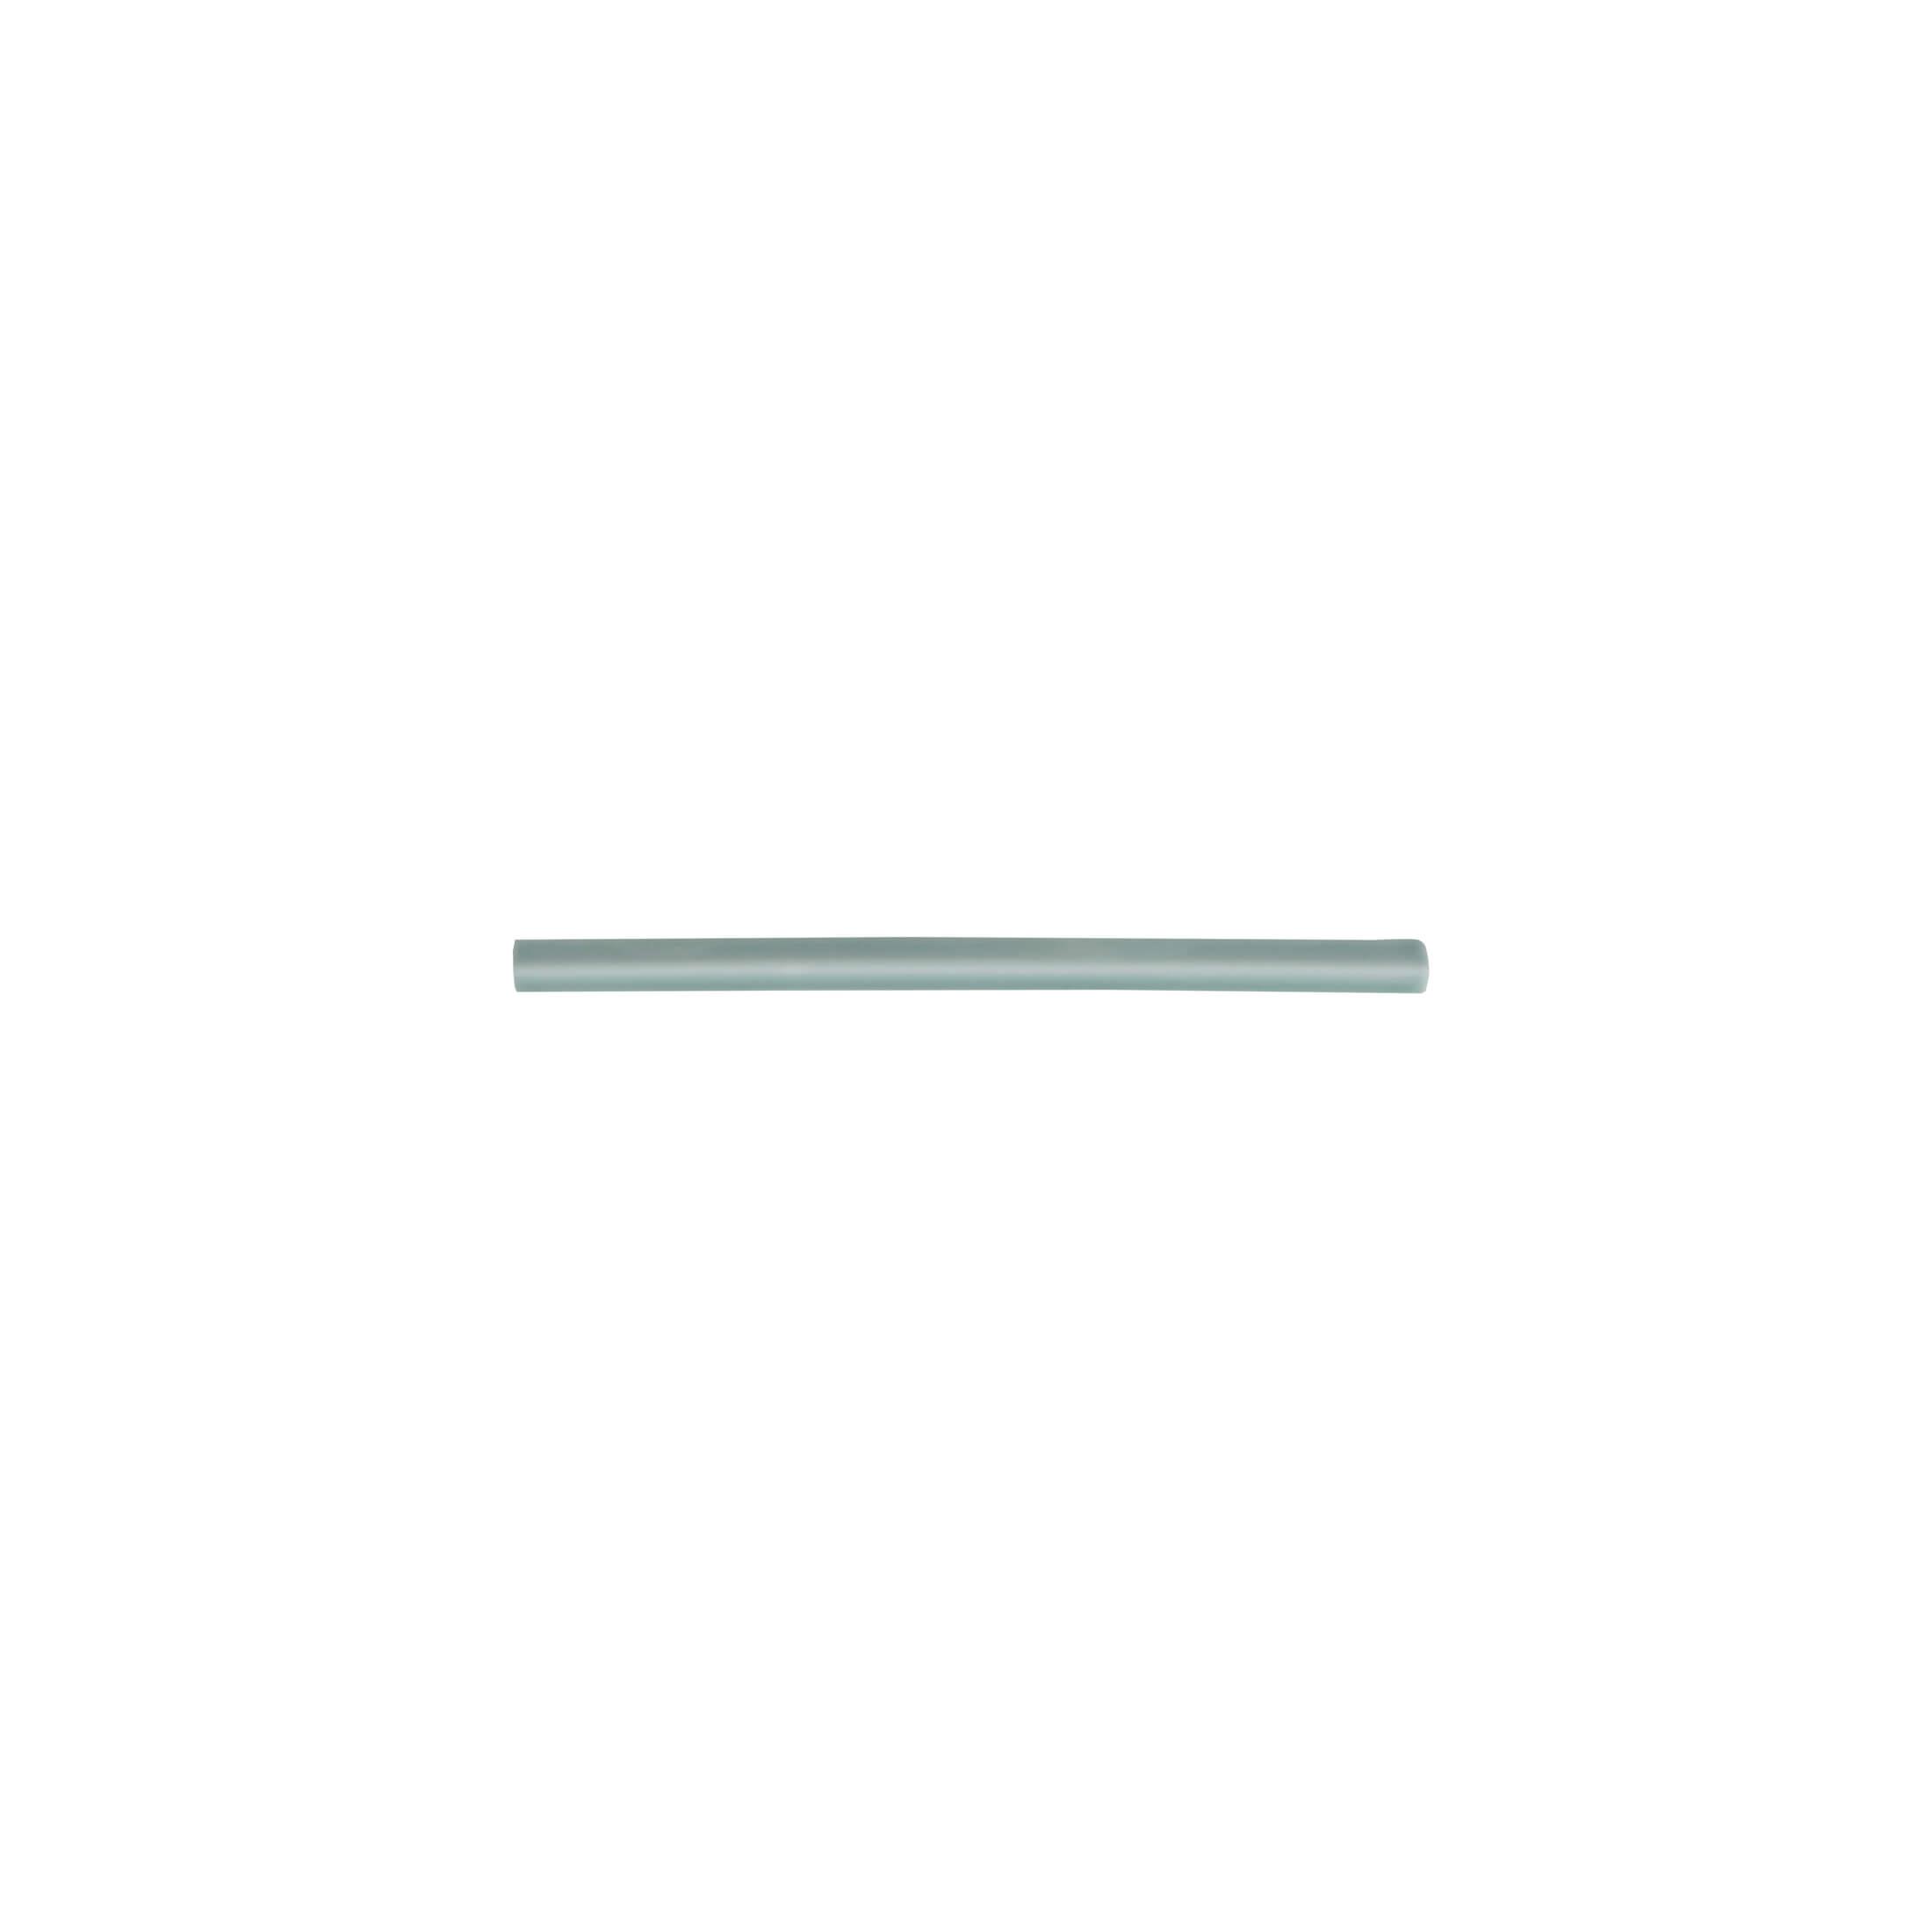 ADNE5635 - BULLNOSE TRIM - 0.85 cm X 15 cm